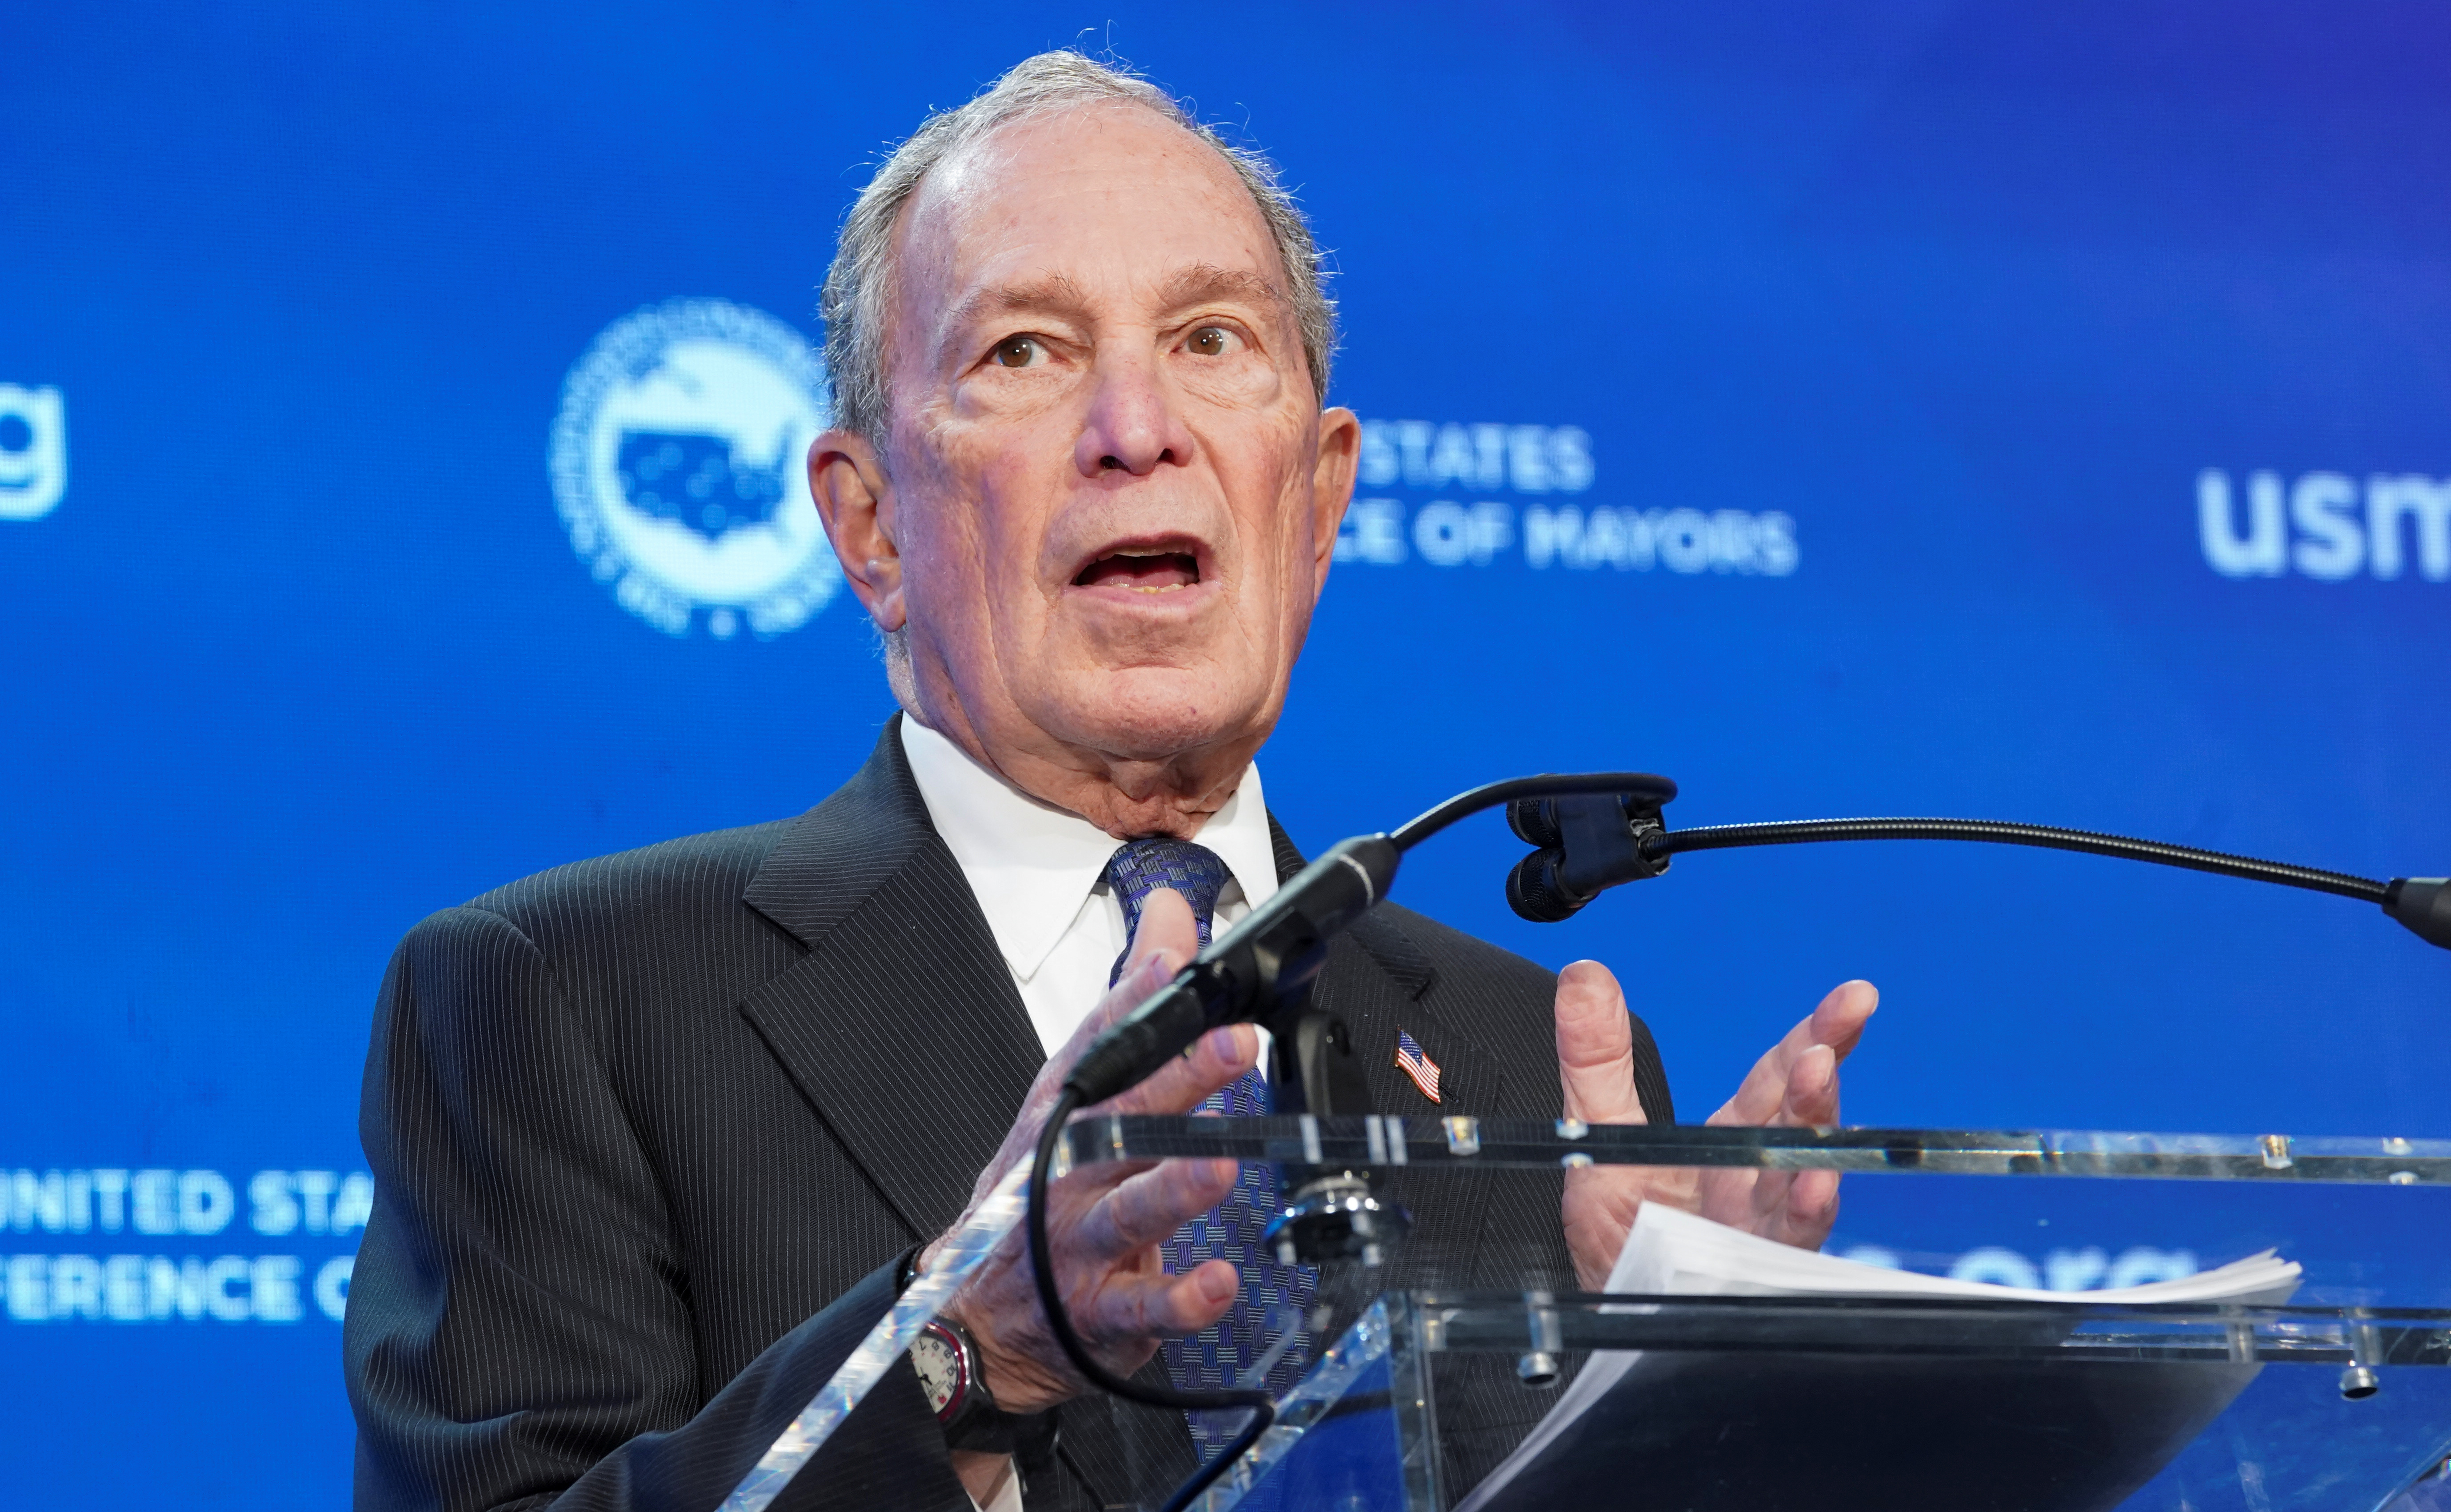 U.S. candidate Bloomberg vows to back Israel, takes dig at Sanders